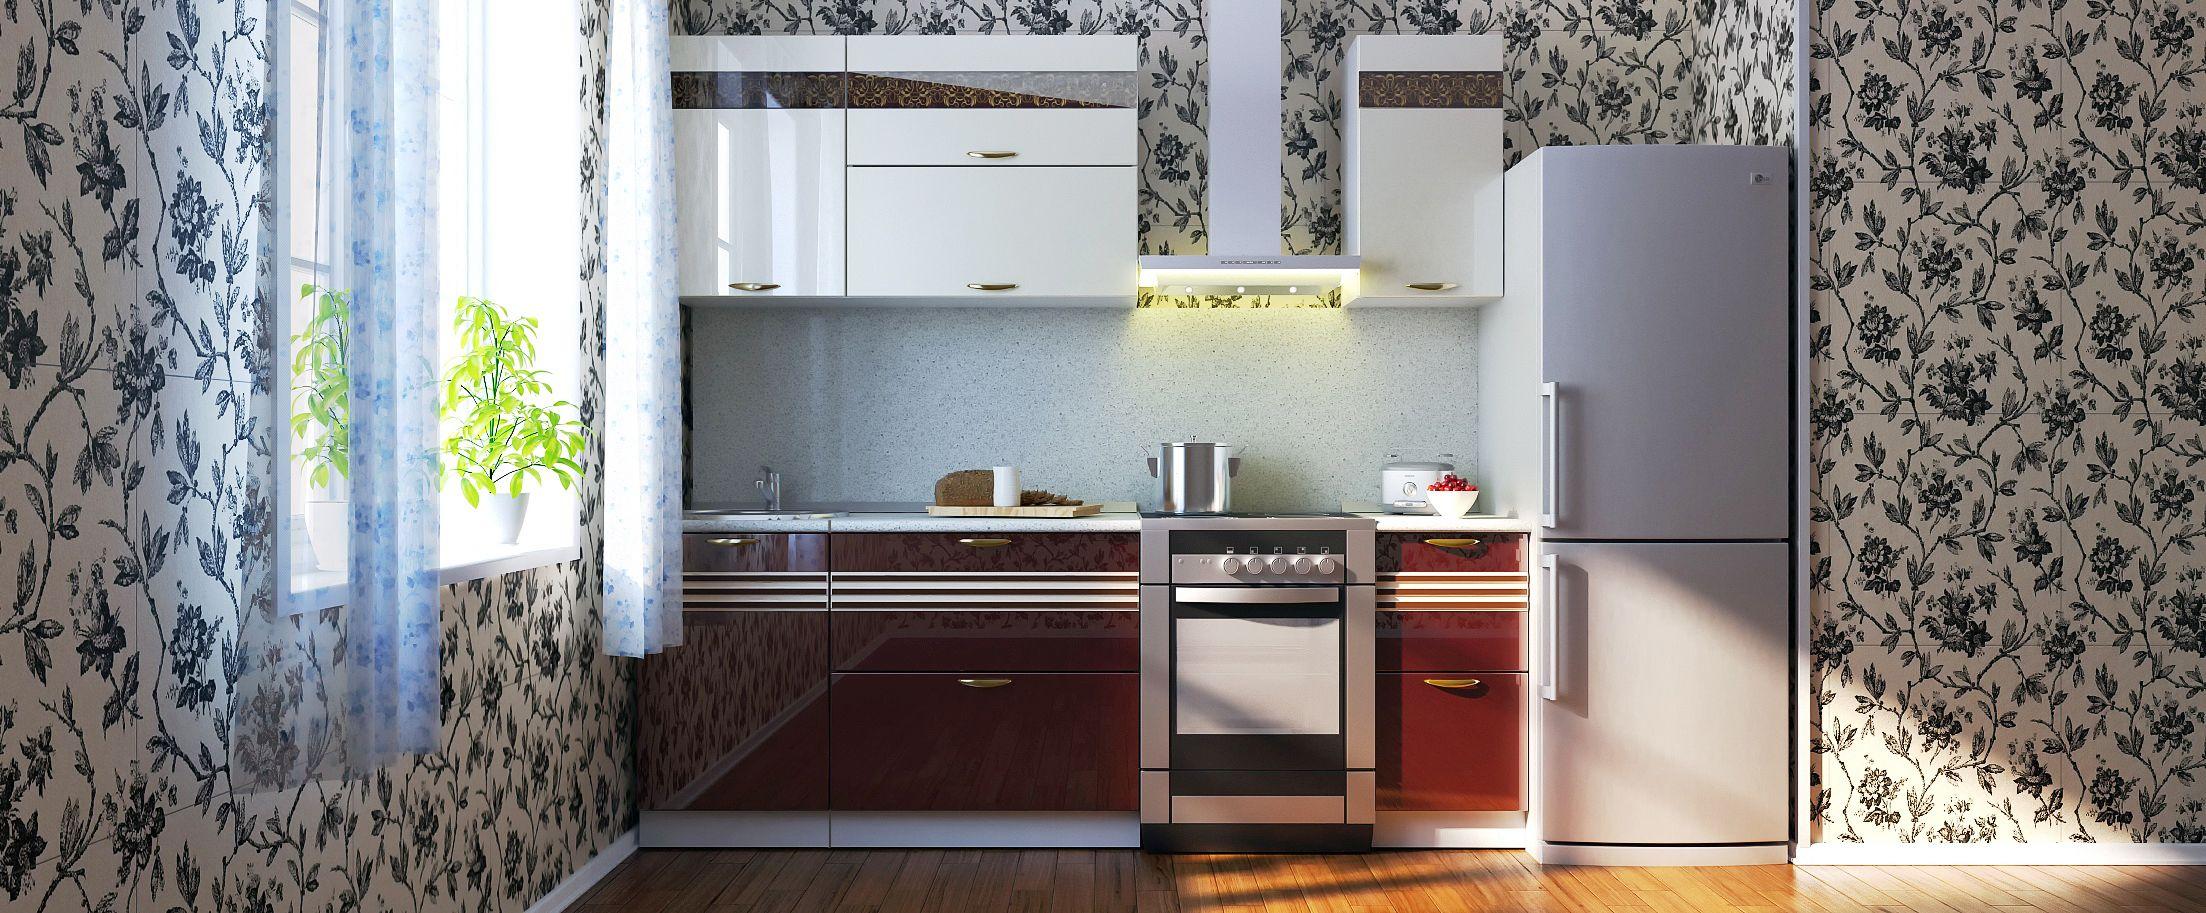 Кухня Корица 1,7 м от MOON TRADE